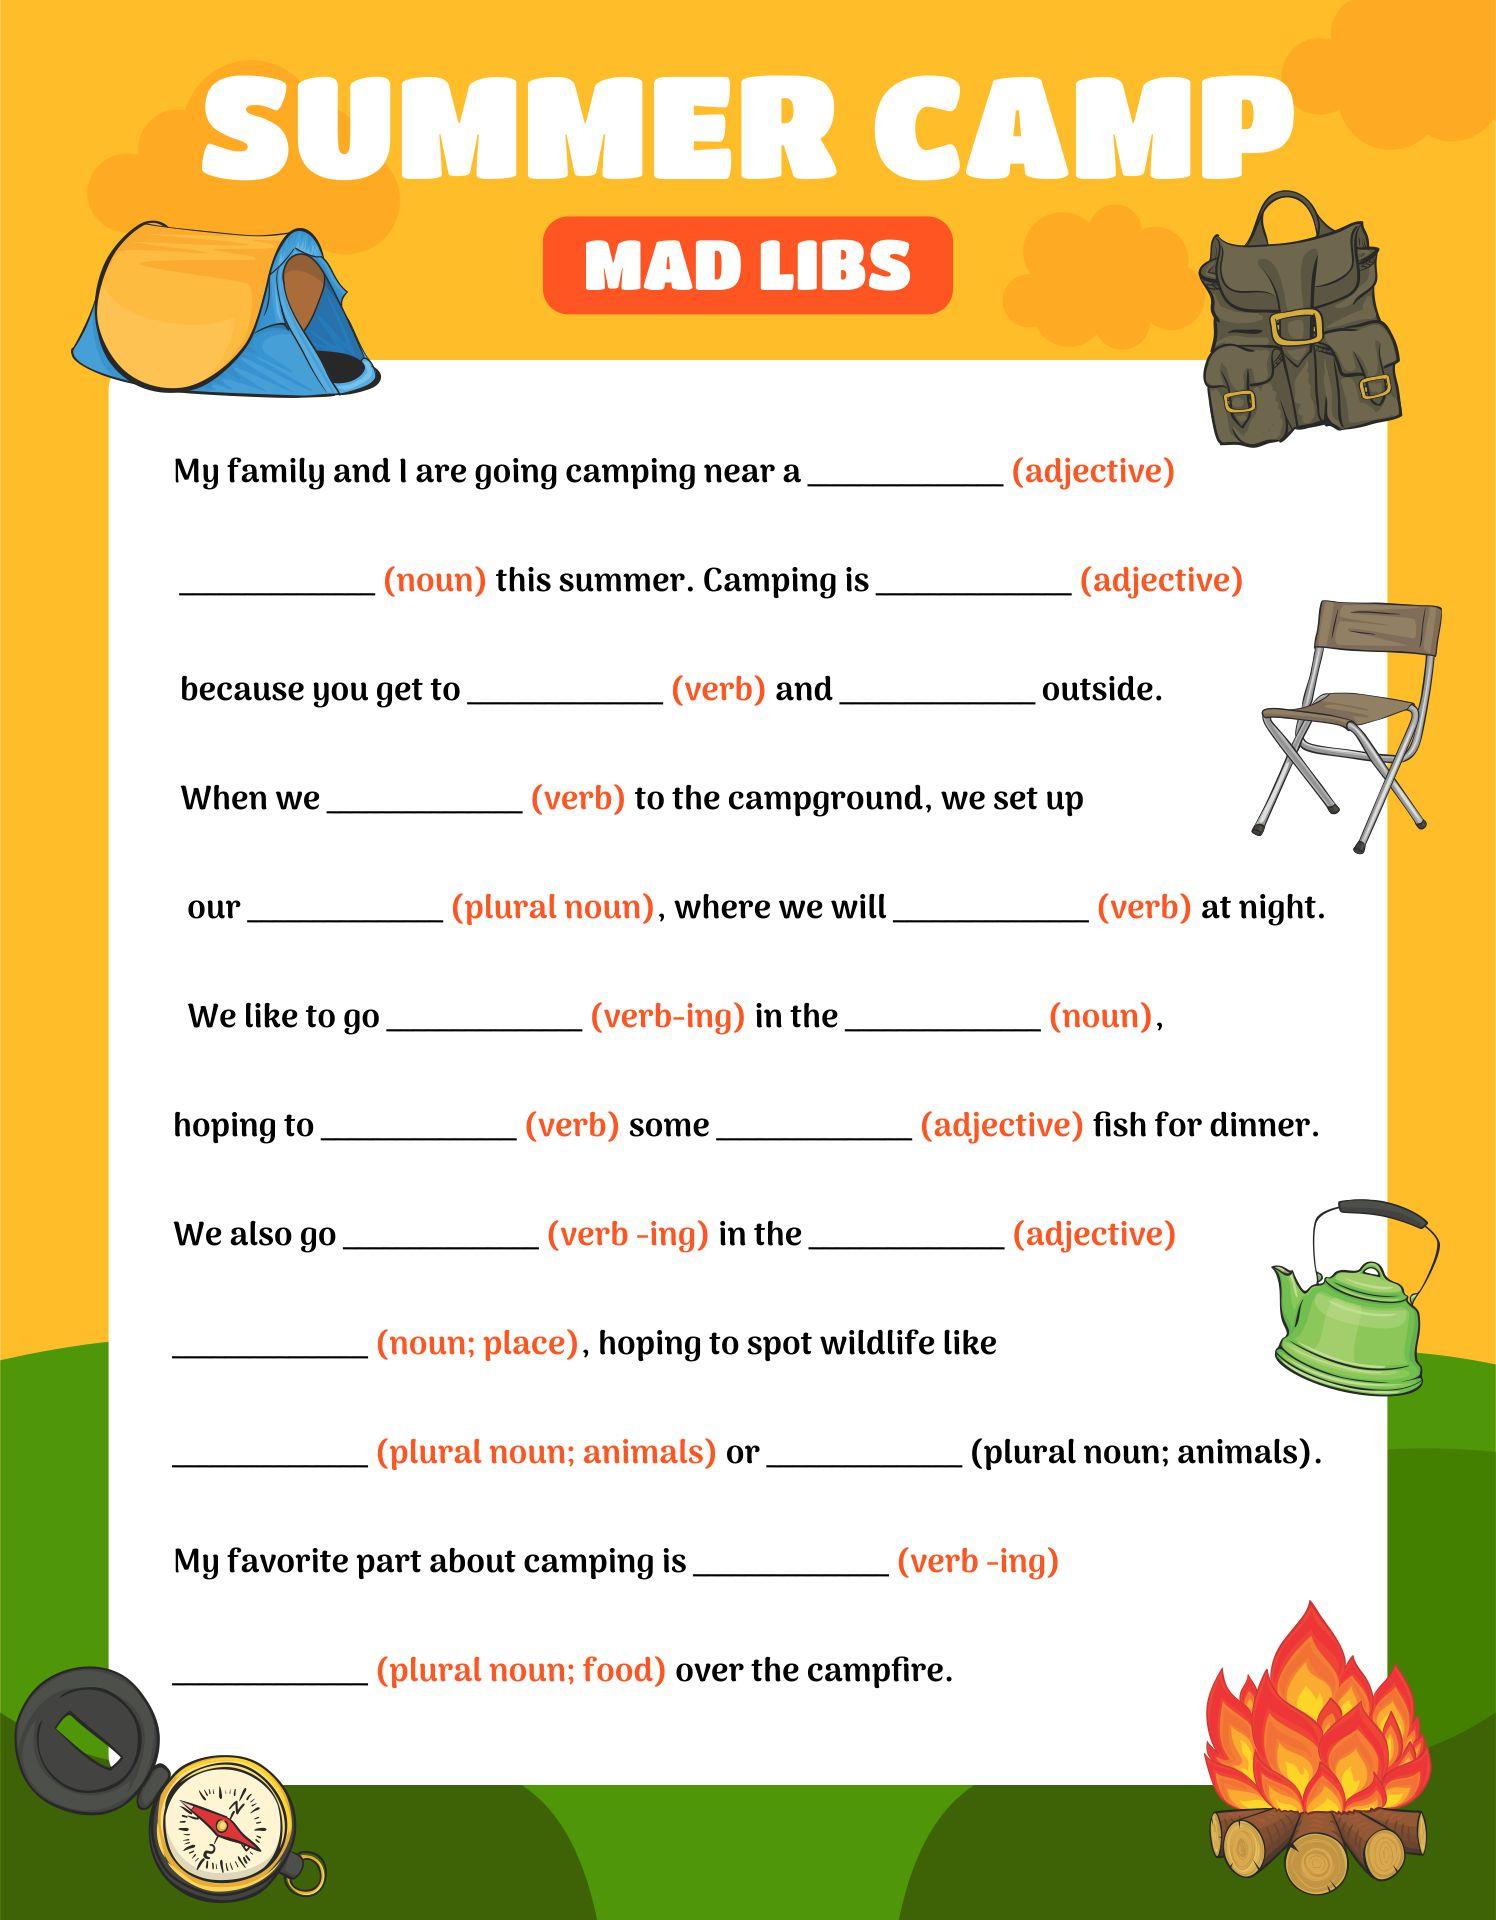 Summer Mad Libs Printable